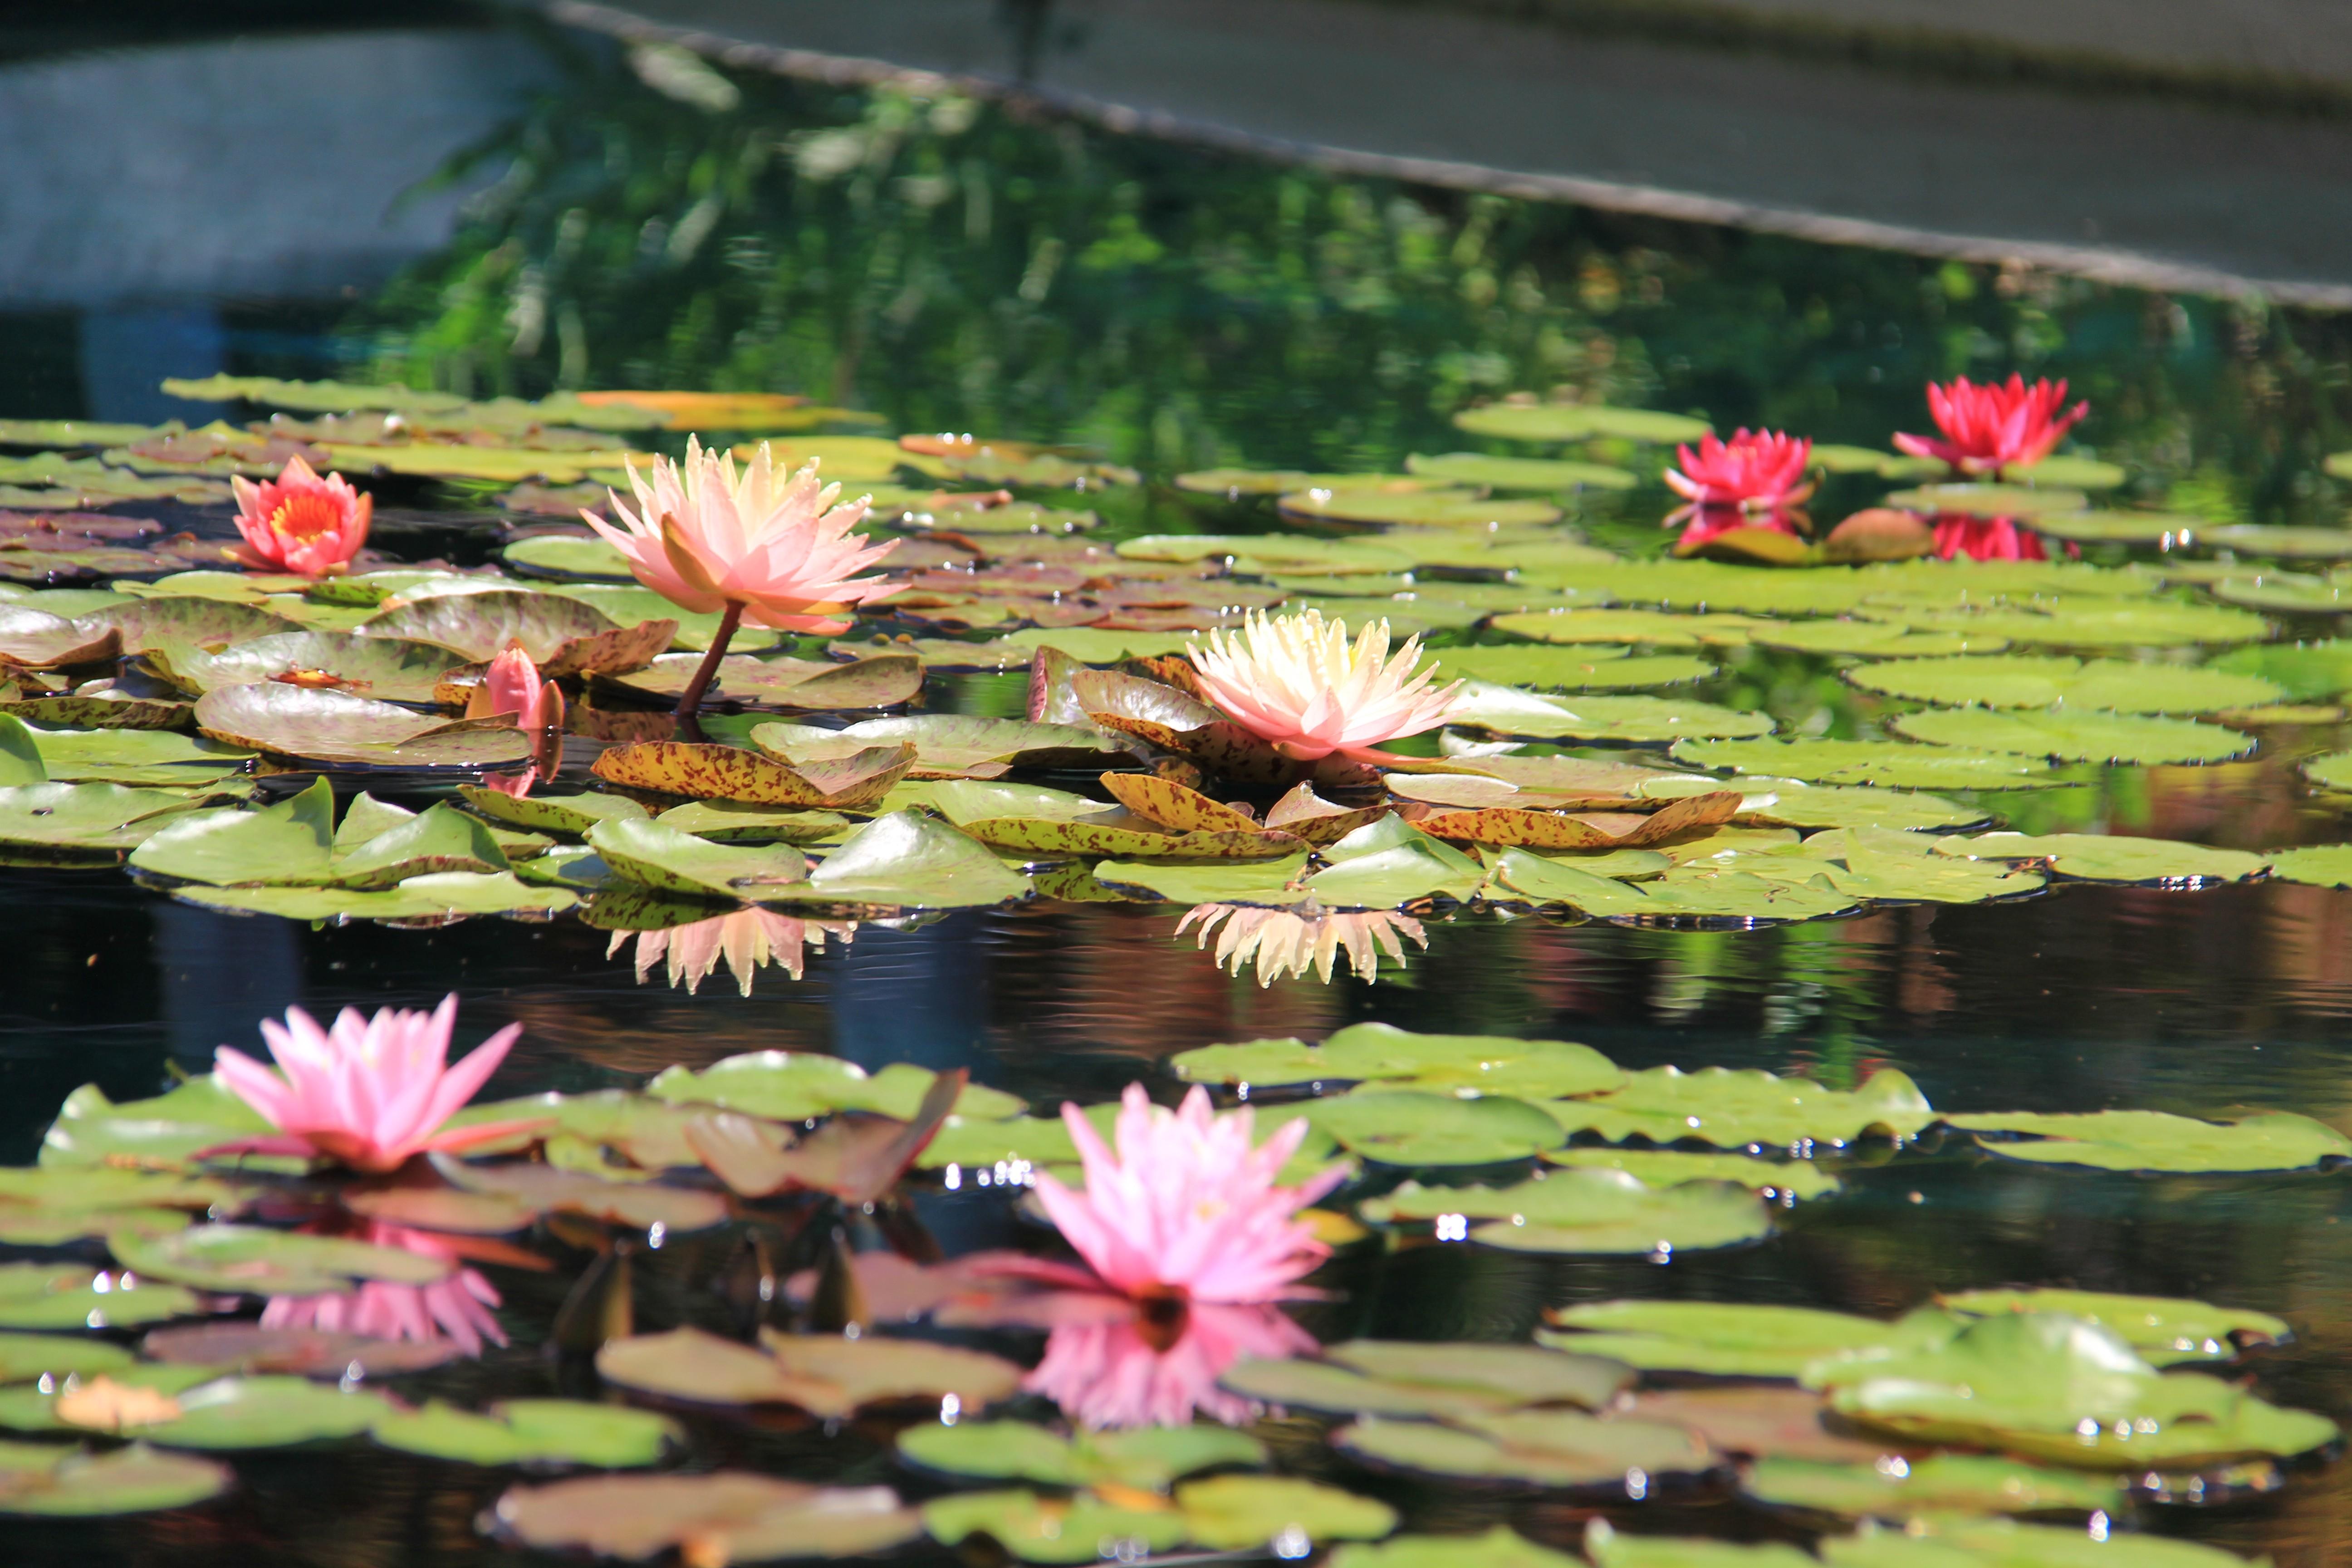 1596137993705?e=2159024400&v=beta&t=fwT1gRZzRnMZs59a q C23IZQzYpBU4DepbF iNktgk - Royal Botanical Gardens 680 Plains Road West Burlington On Canada